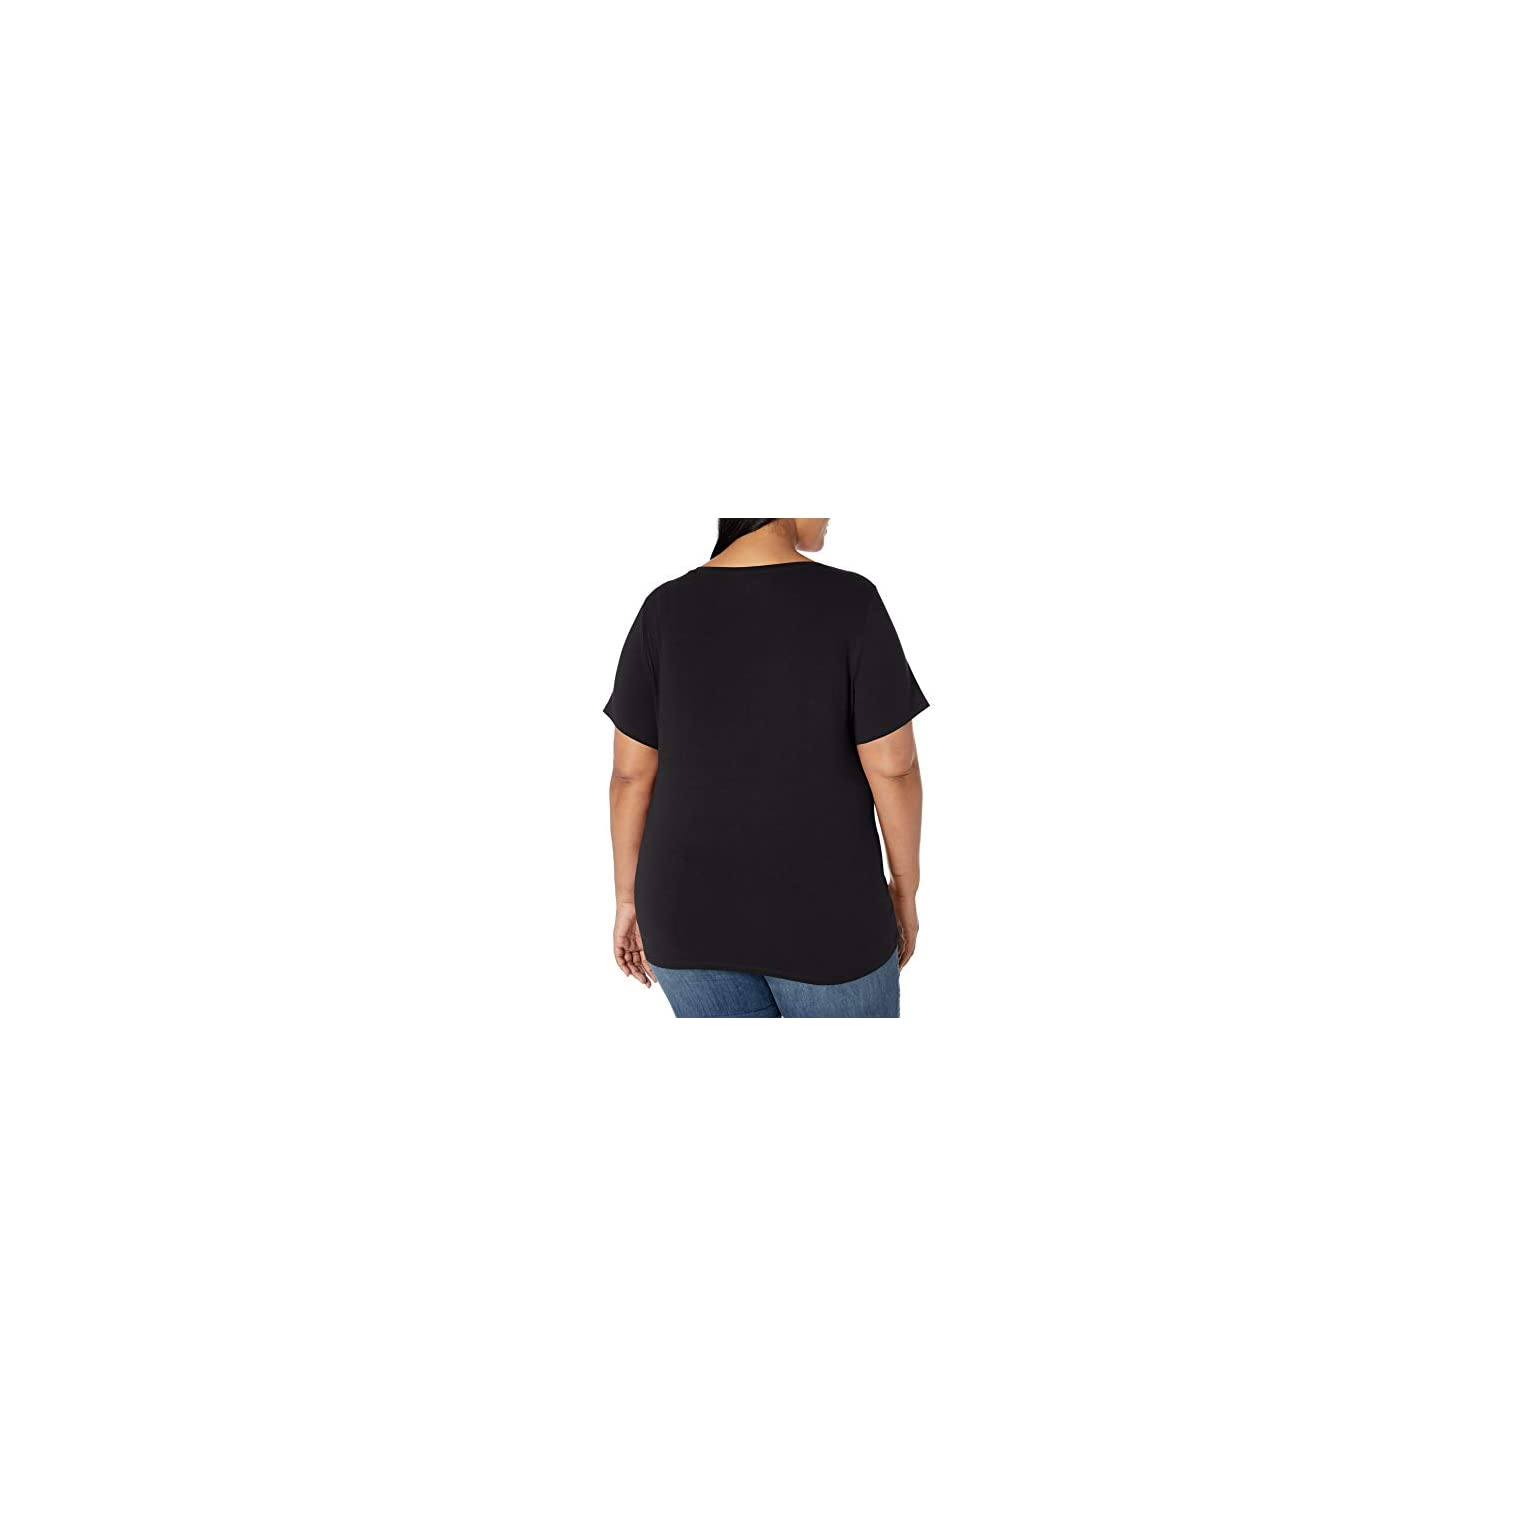 Odlo Herren Shirt Bl Top V-Neck Tank Aion